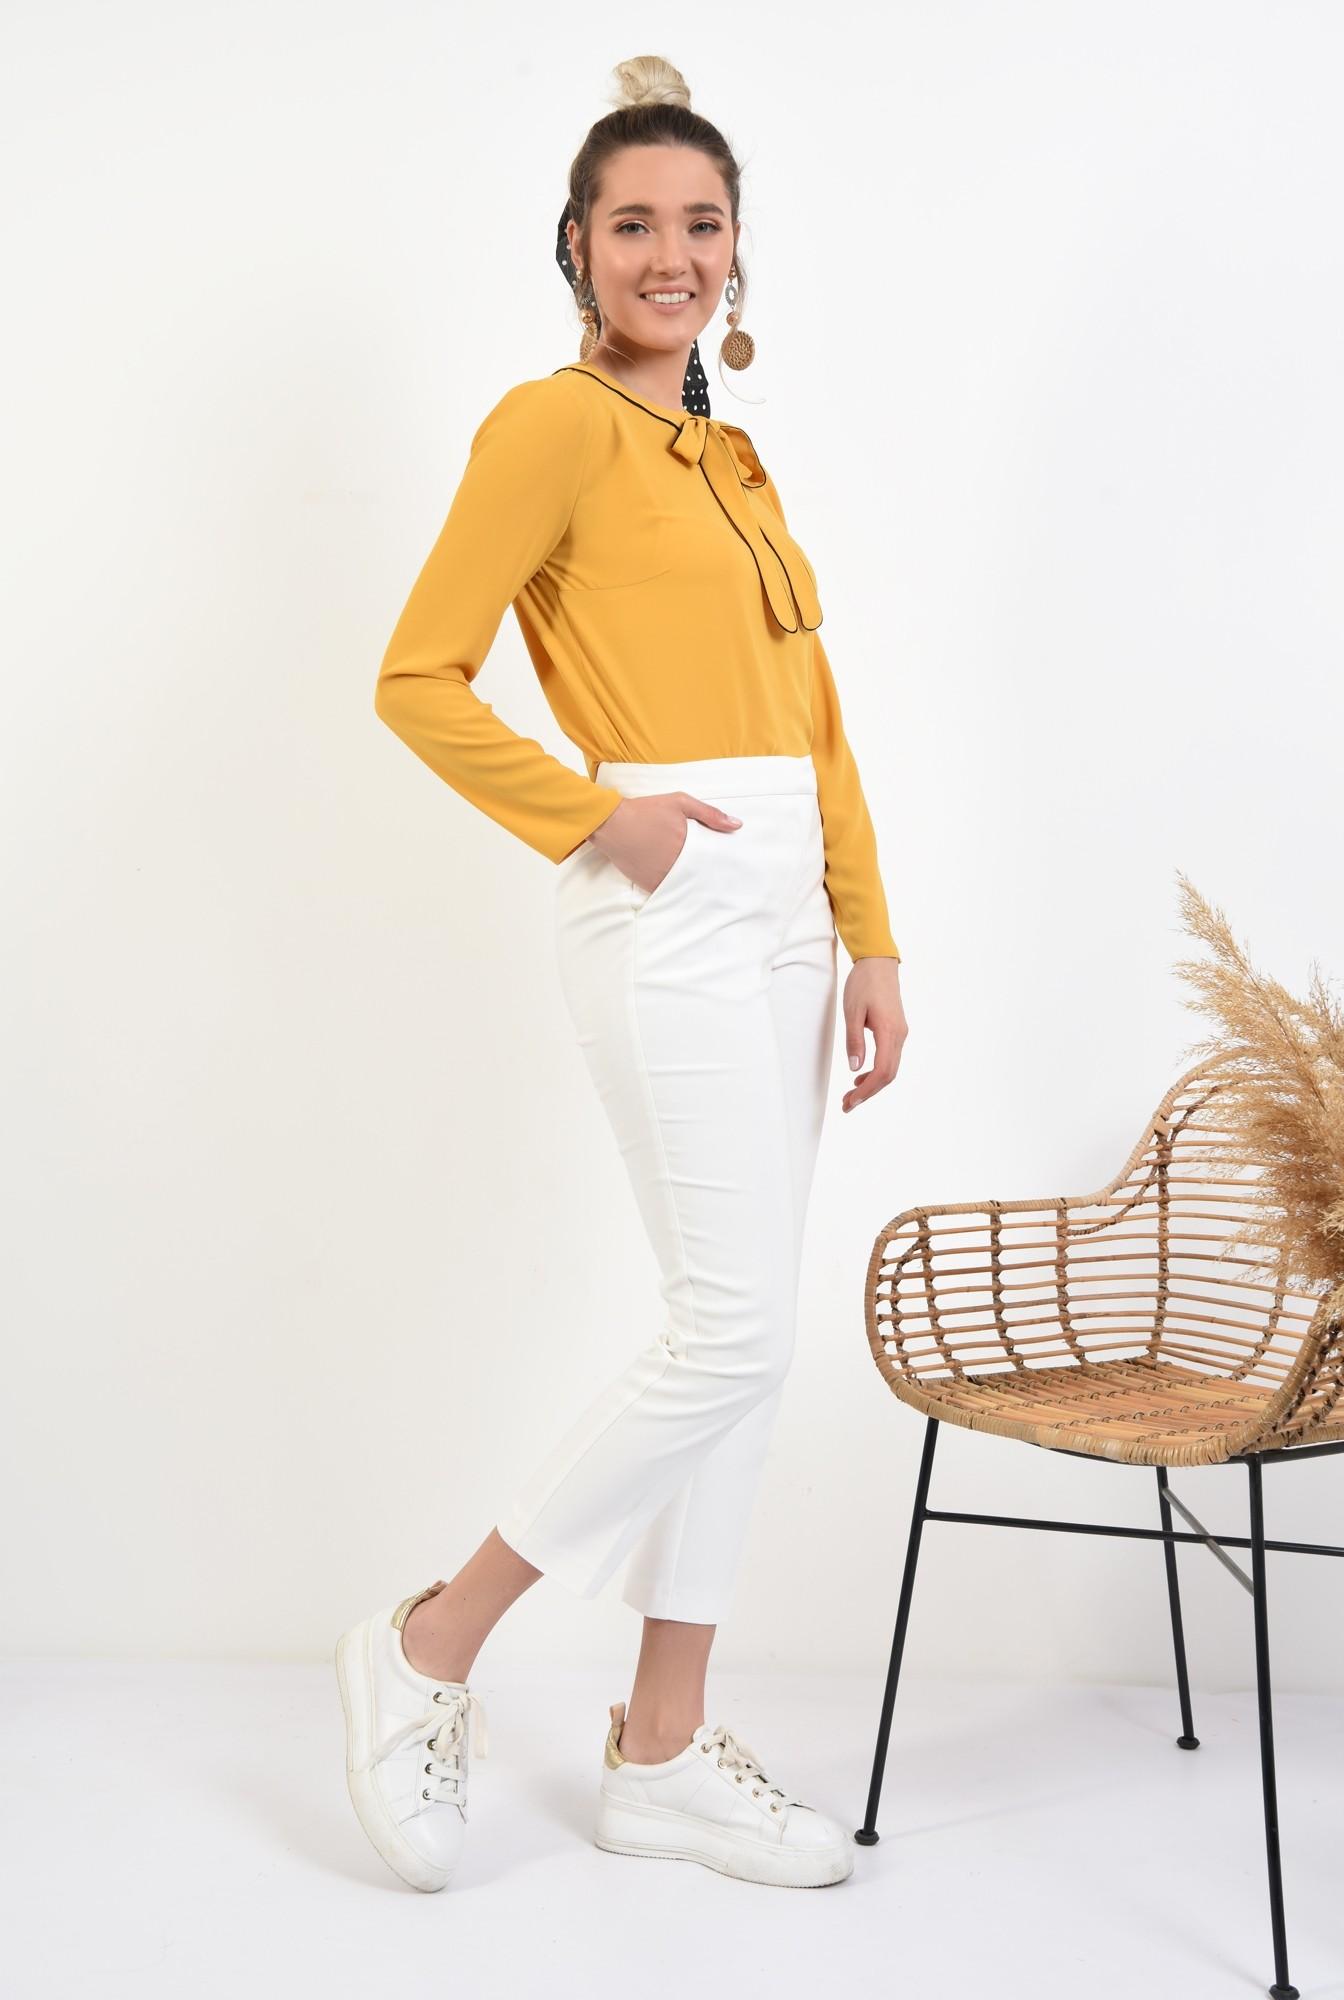 3 - bluza office, maneci lungi, funda cu borduri contrastante, mustar, bluza de primavara